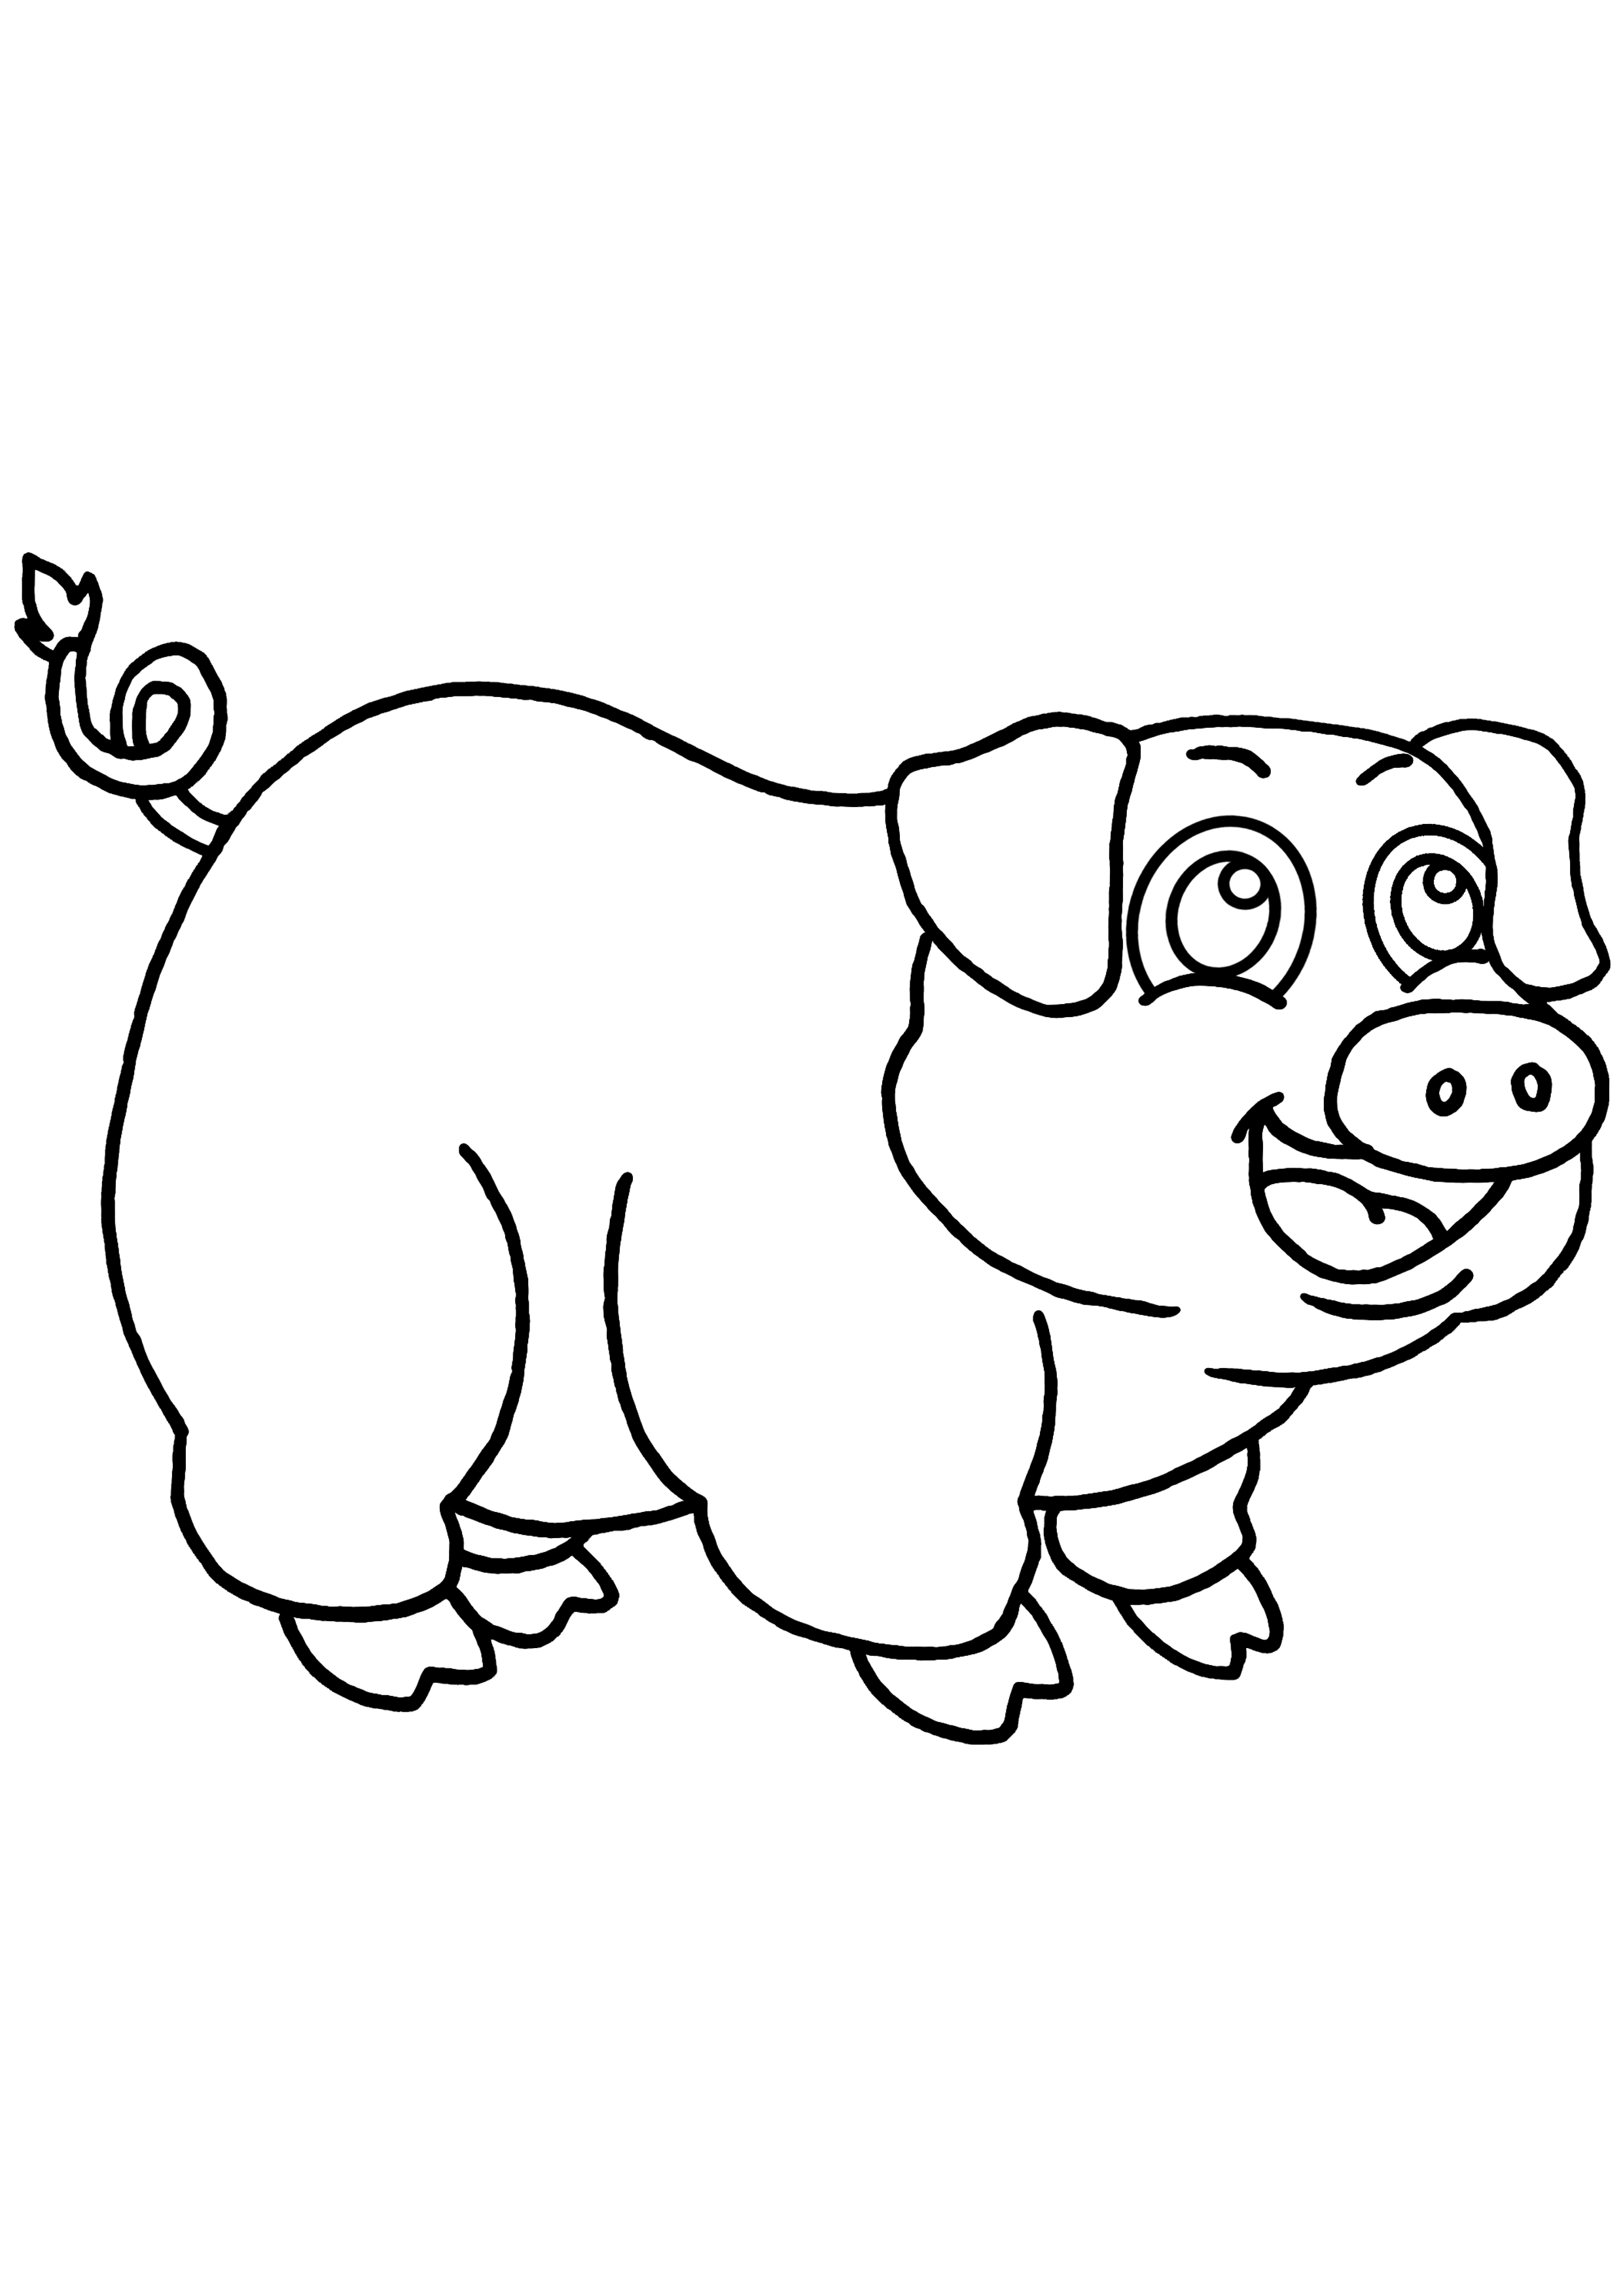 Coloriage dessiner cochon d 39 inde imprimer - Cochon a dessiner ...